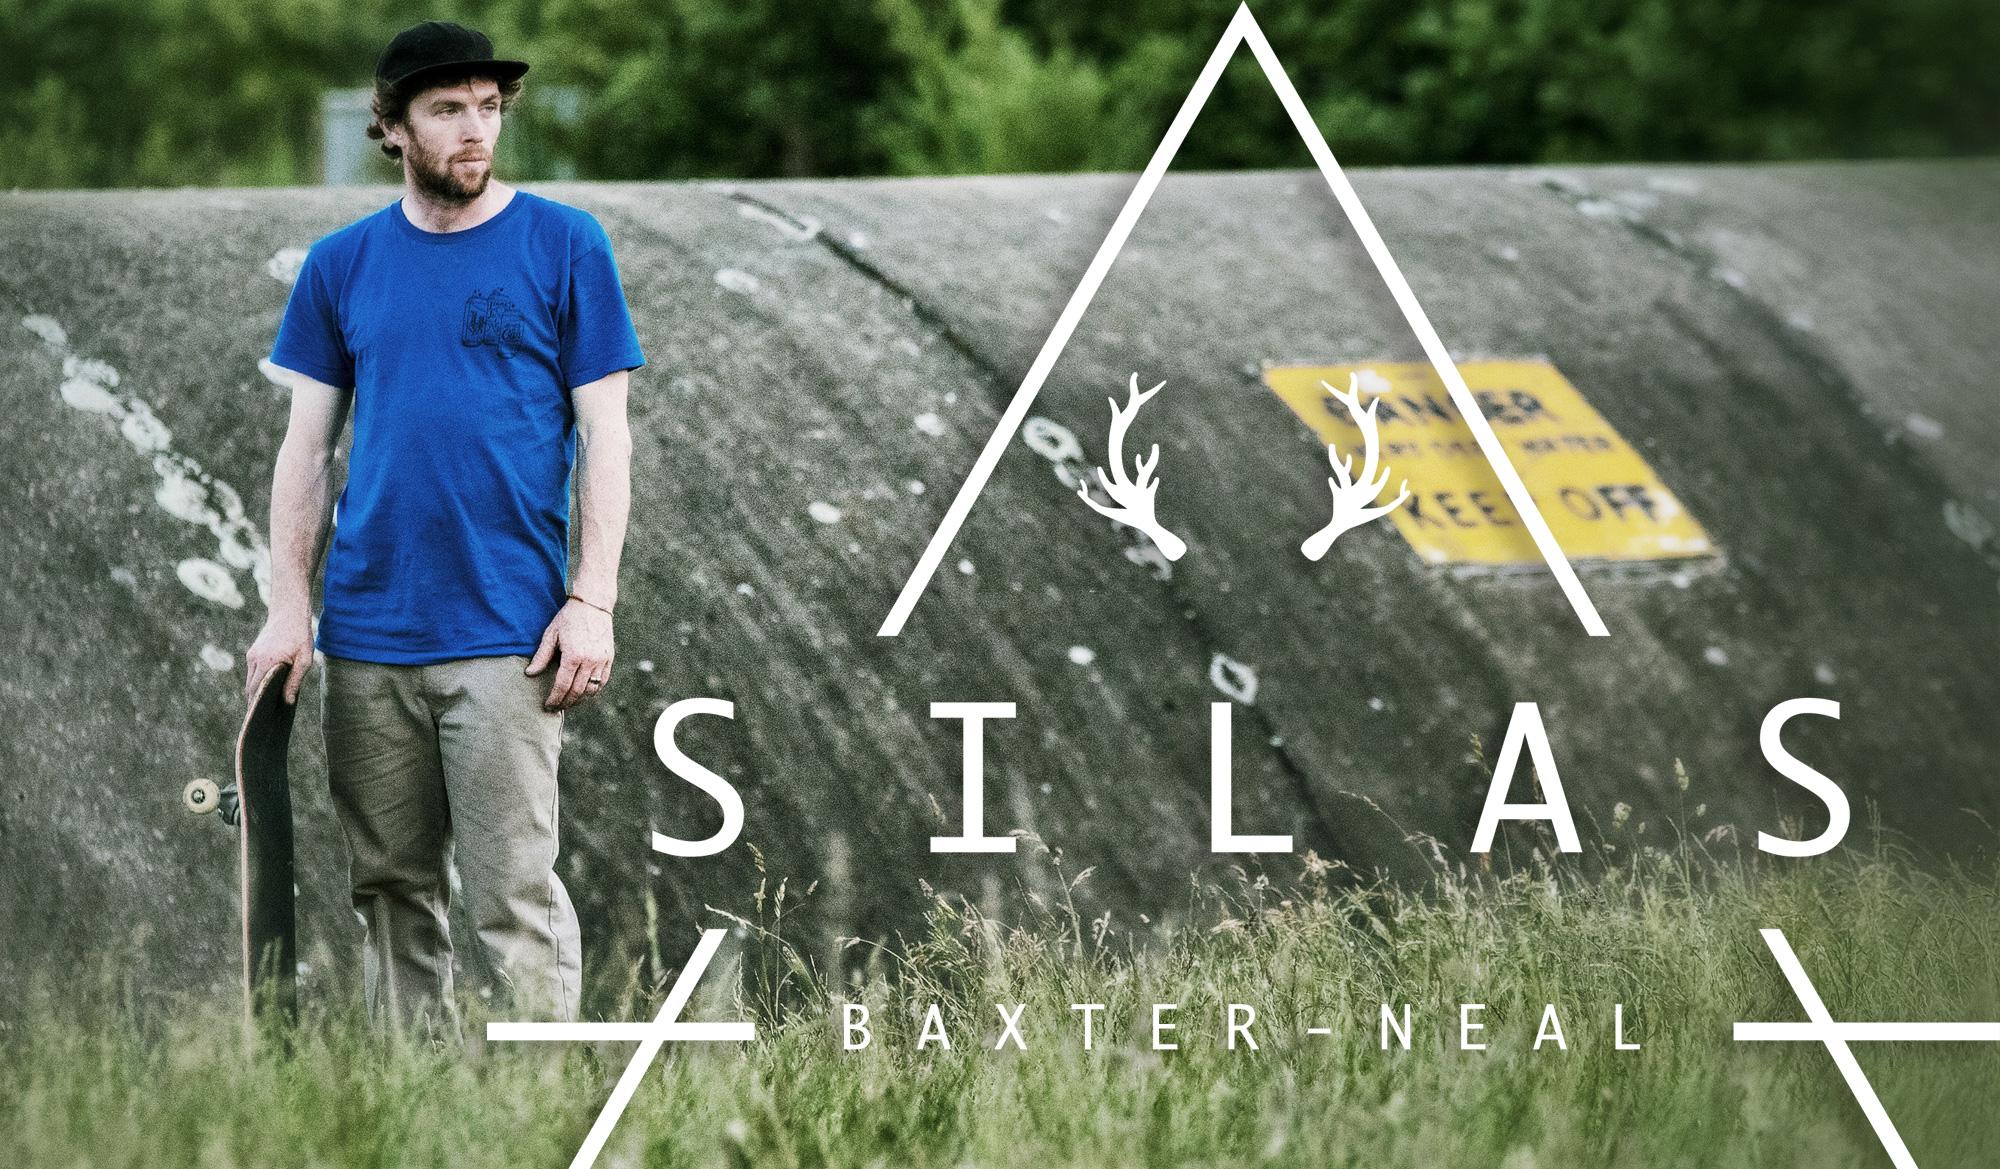 Silas Baxter-Neal interview